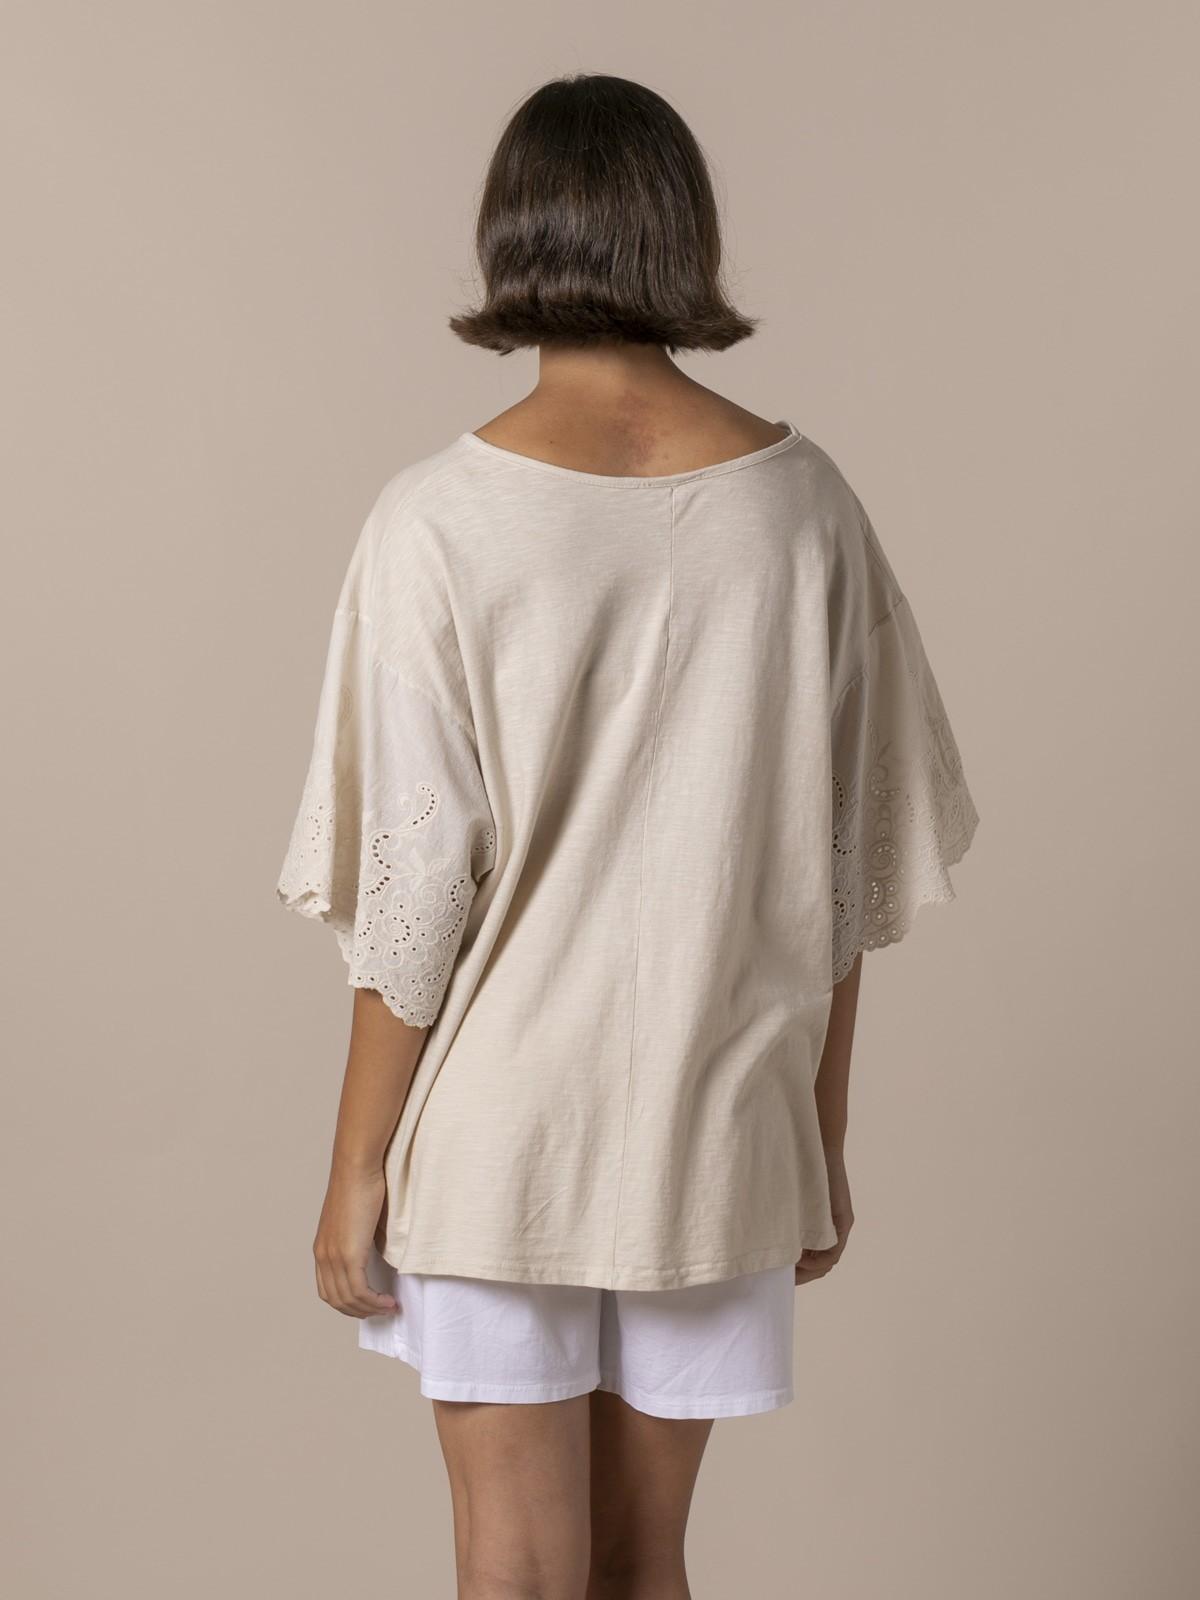 Camiseta mujer bordados y perforada Beige